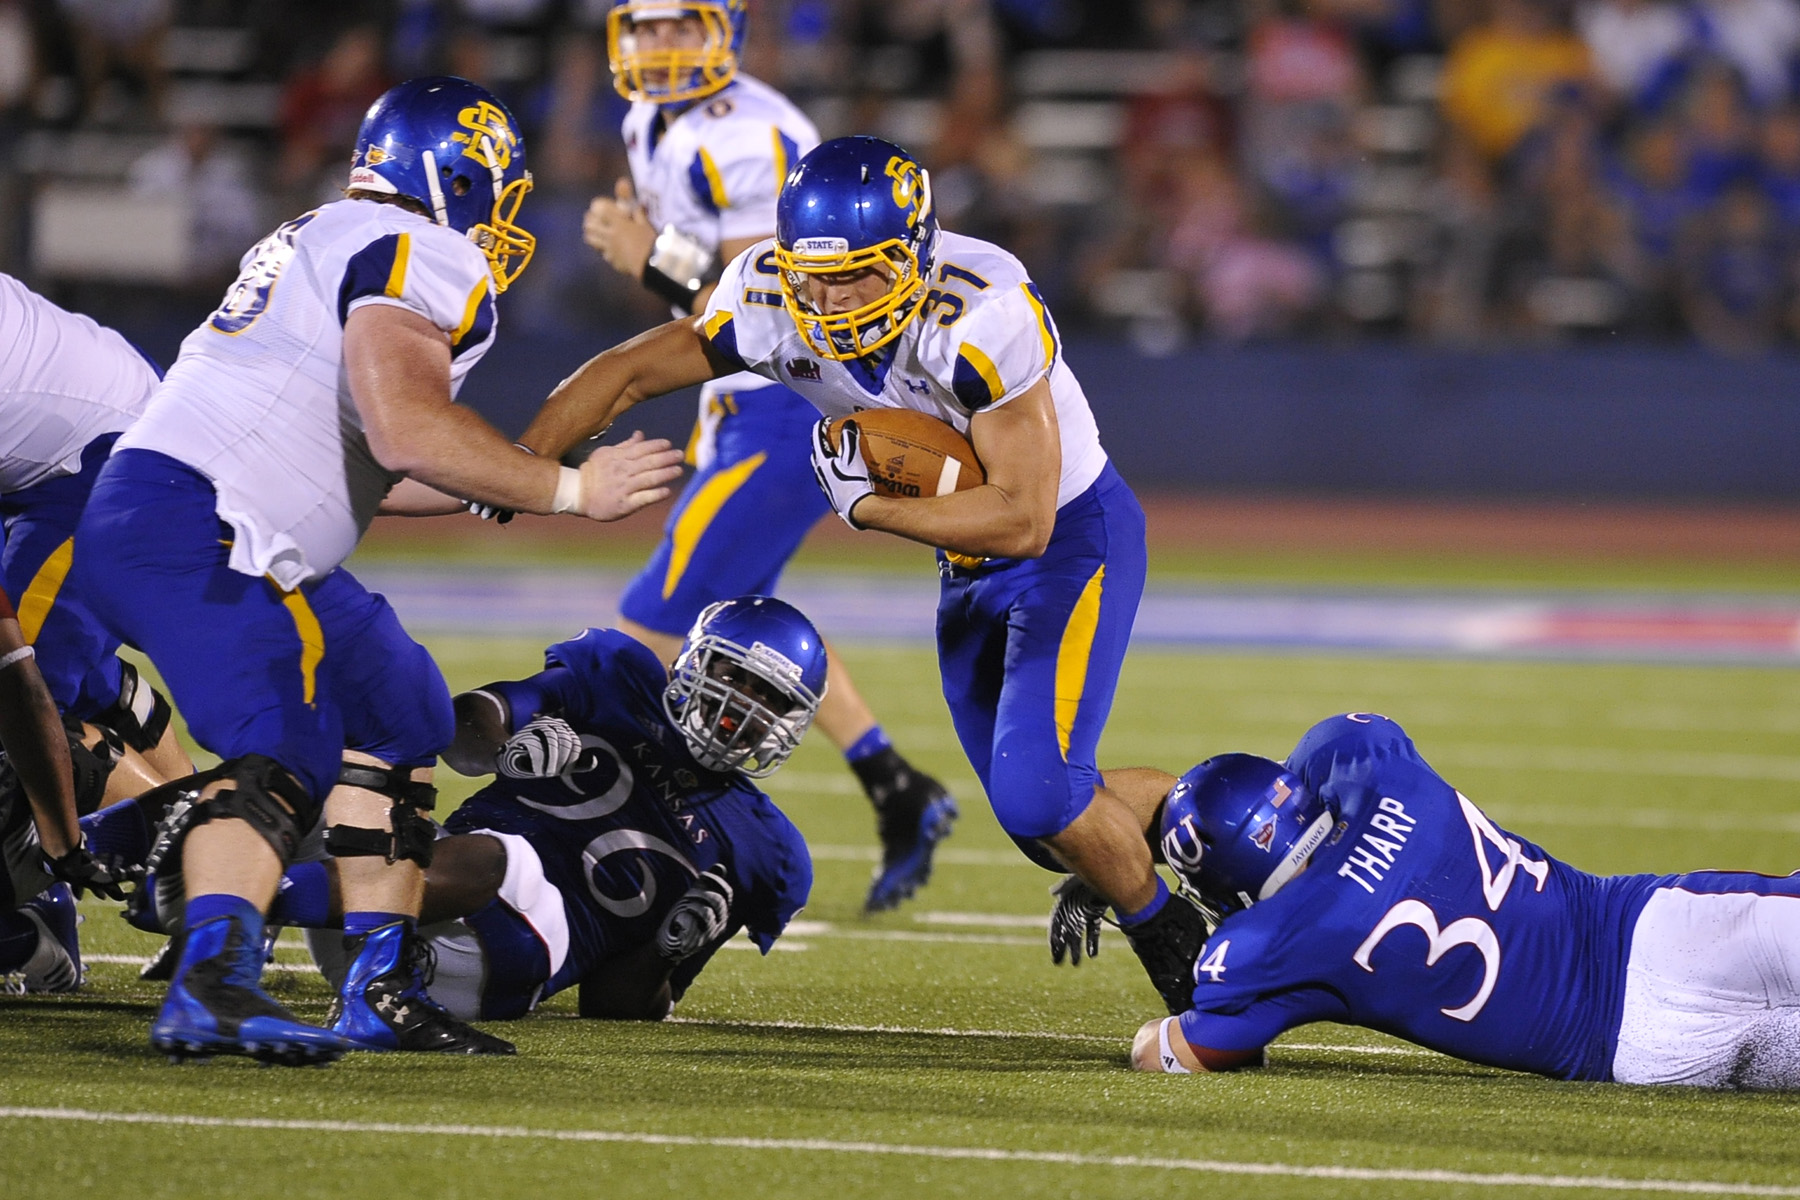 South Dakota State vs. Kansas 9/1/2012